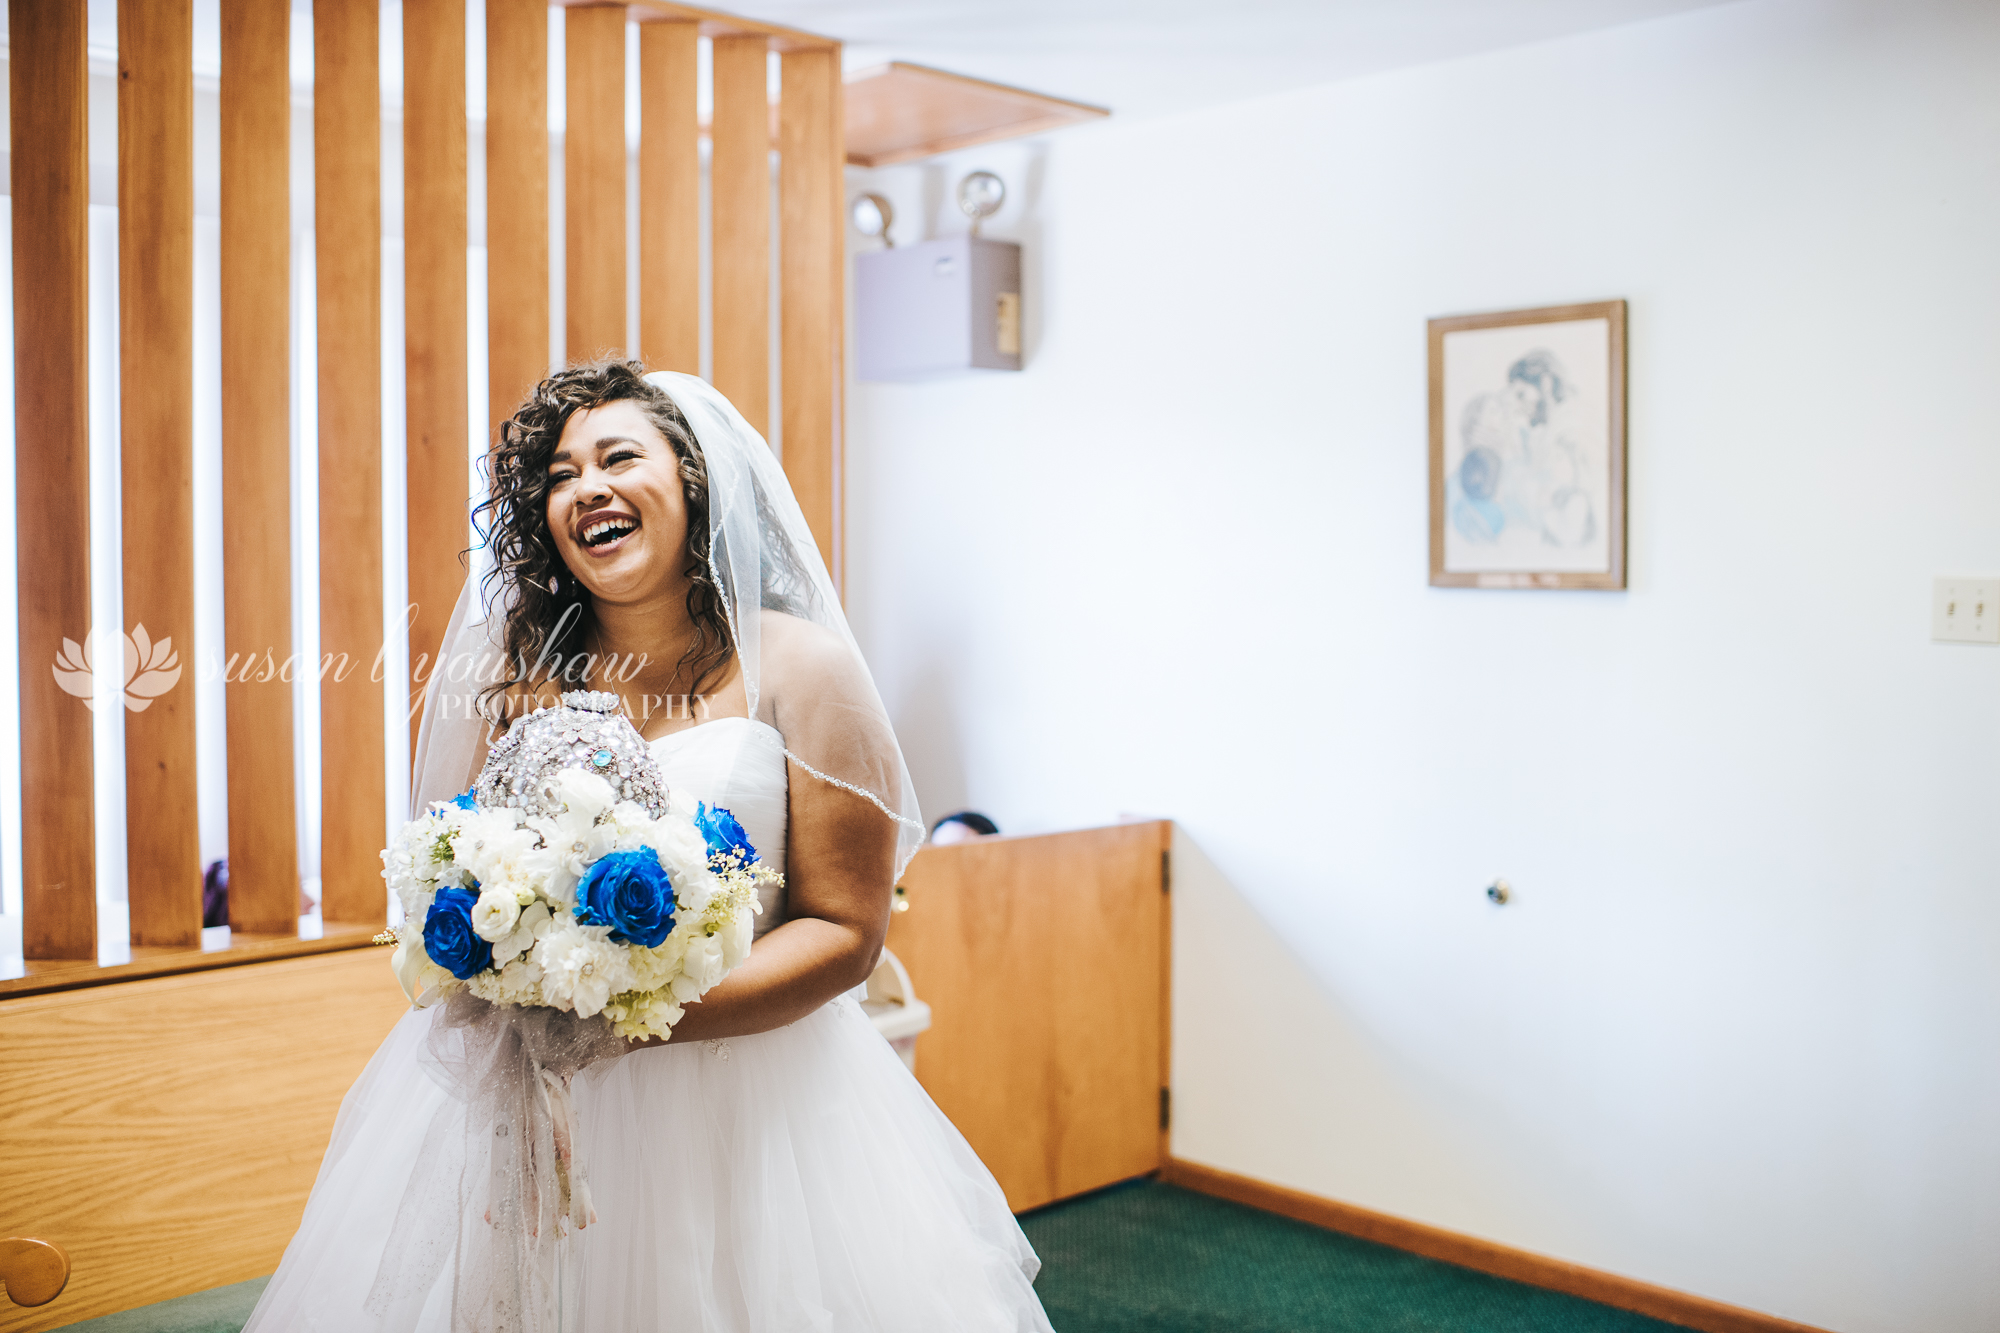 Katelyn and Wes Wedding Photos 07-13-2019 SLY Photography-30.jpg